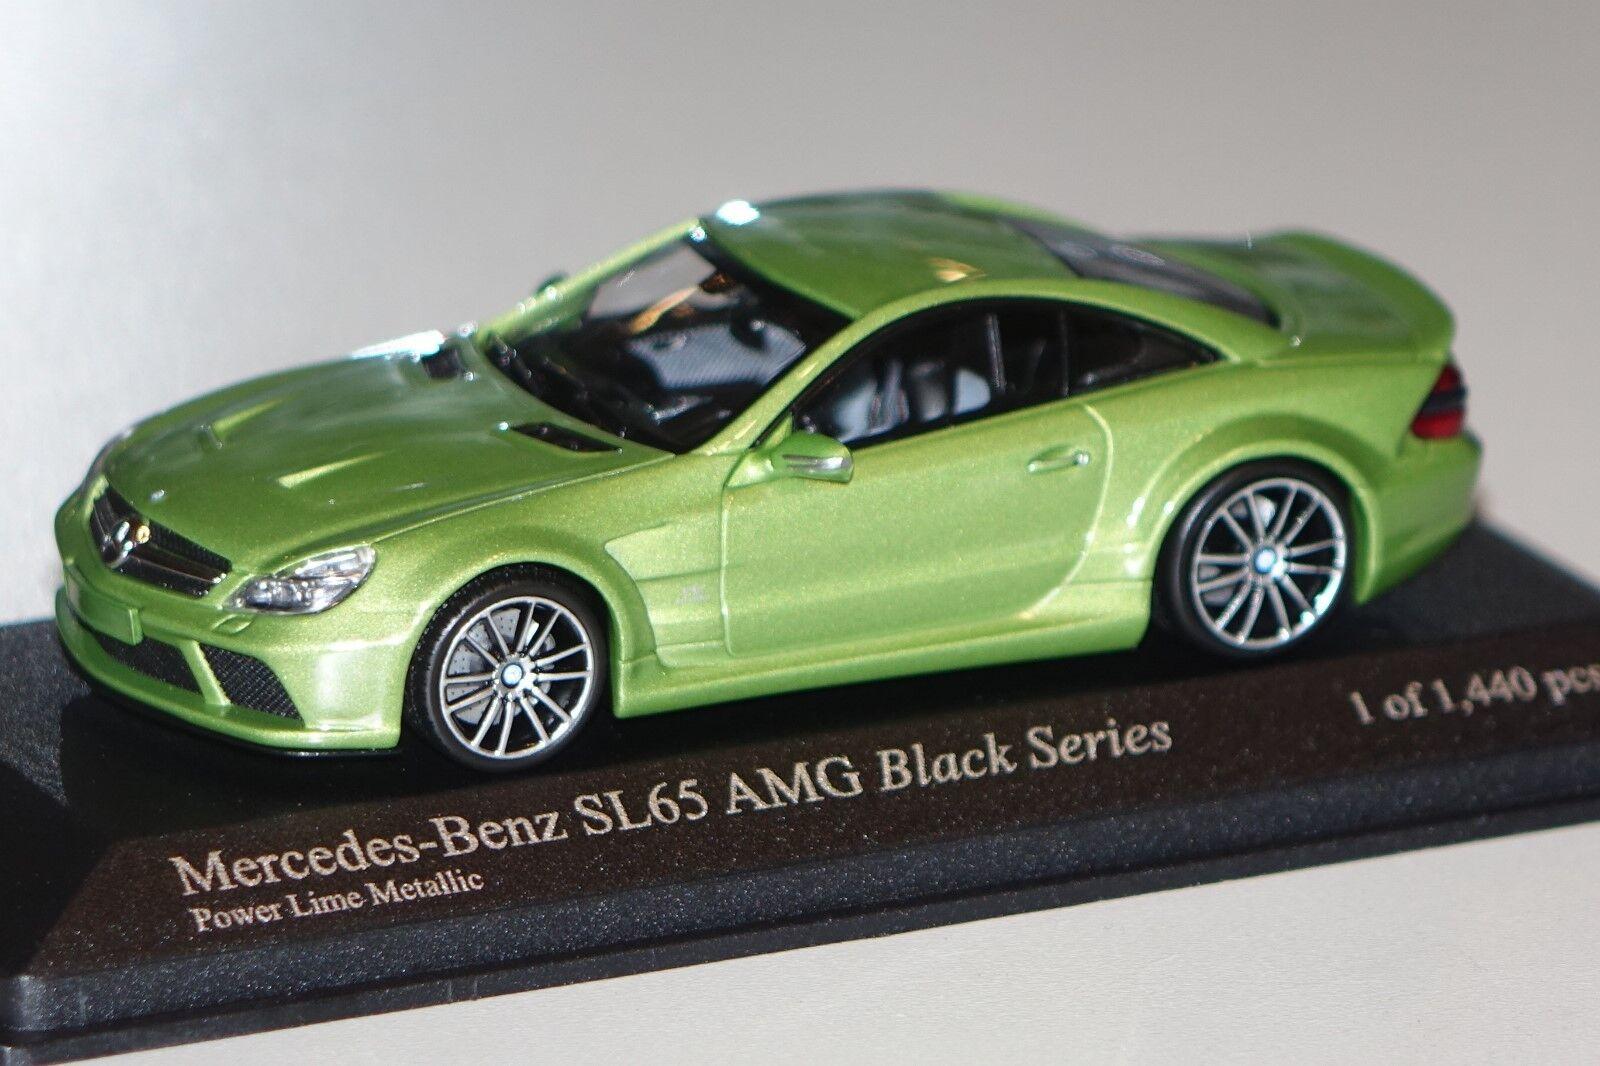 Mercedes SL 65 AMG (r230) vert metallic 1 43 MINICHAMPS 400038221 NOUVEAU & NEUF dans sa boîte